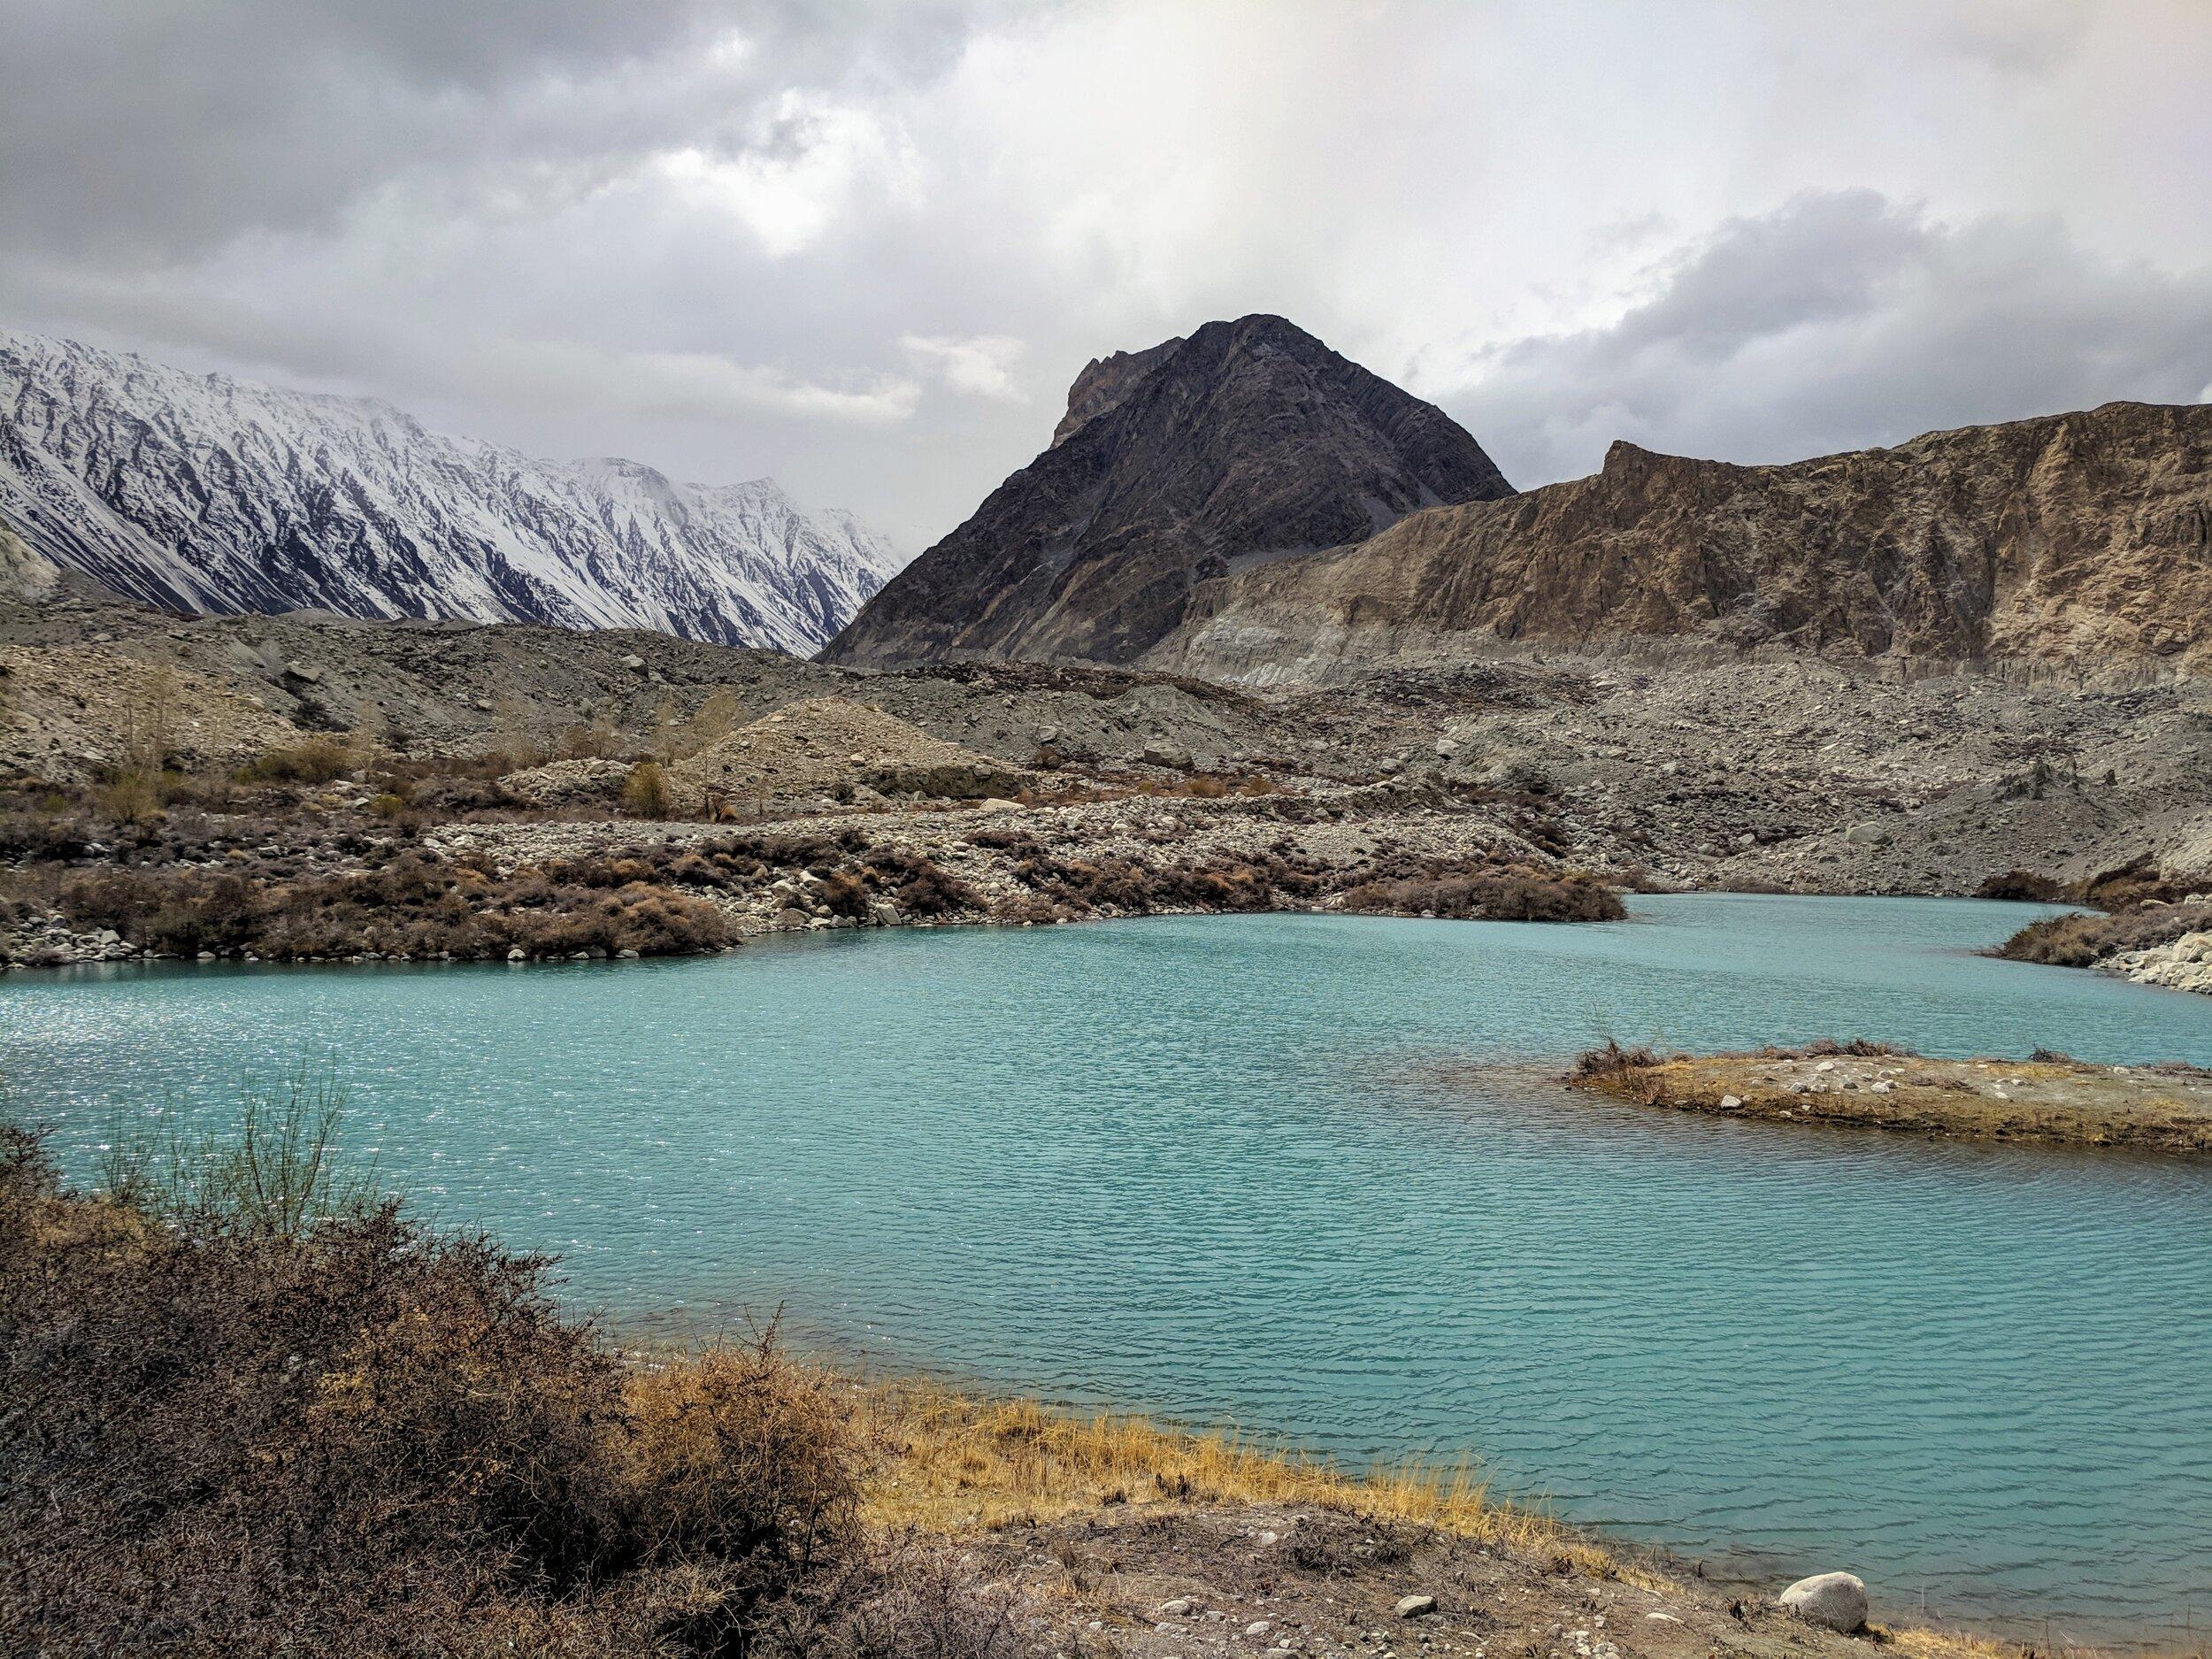 Gojal, Hunza - Nagar